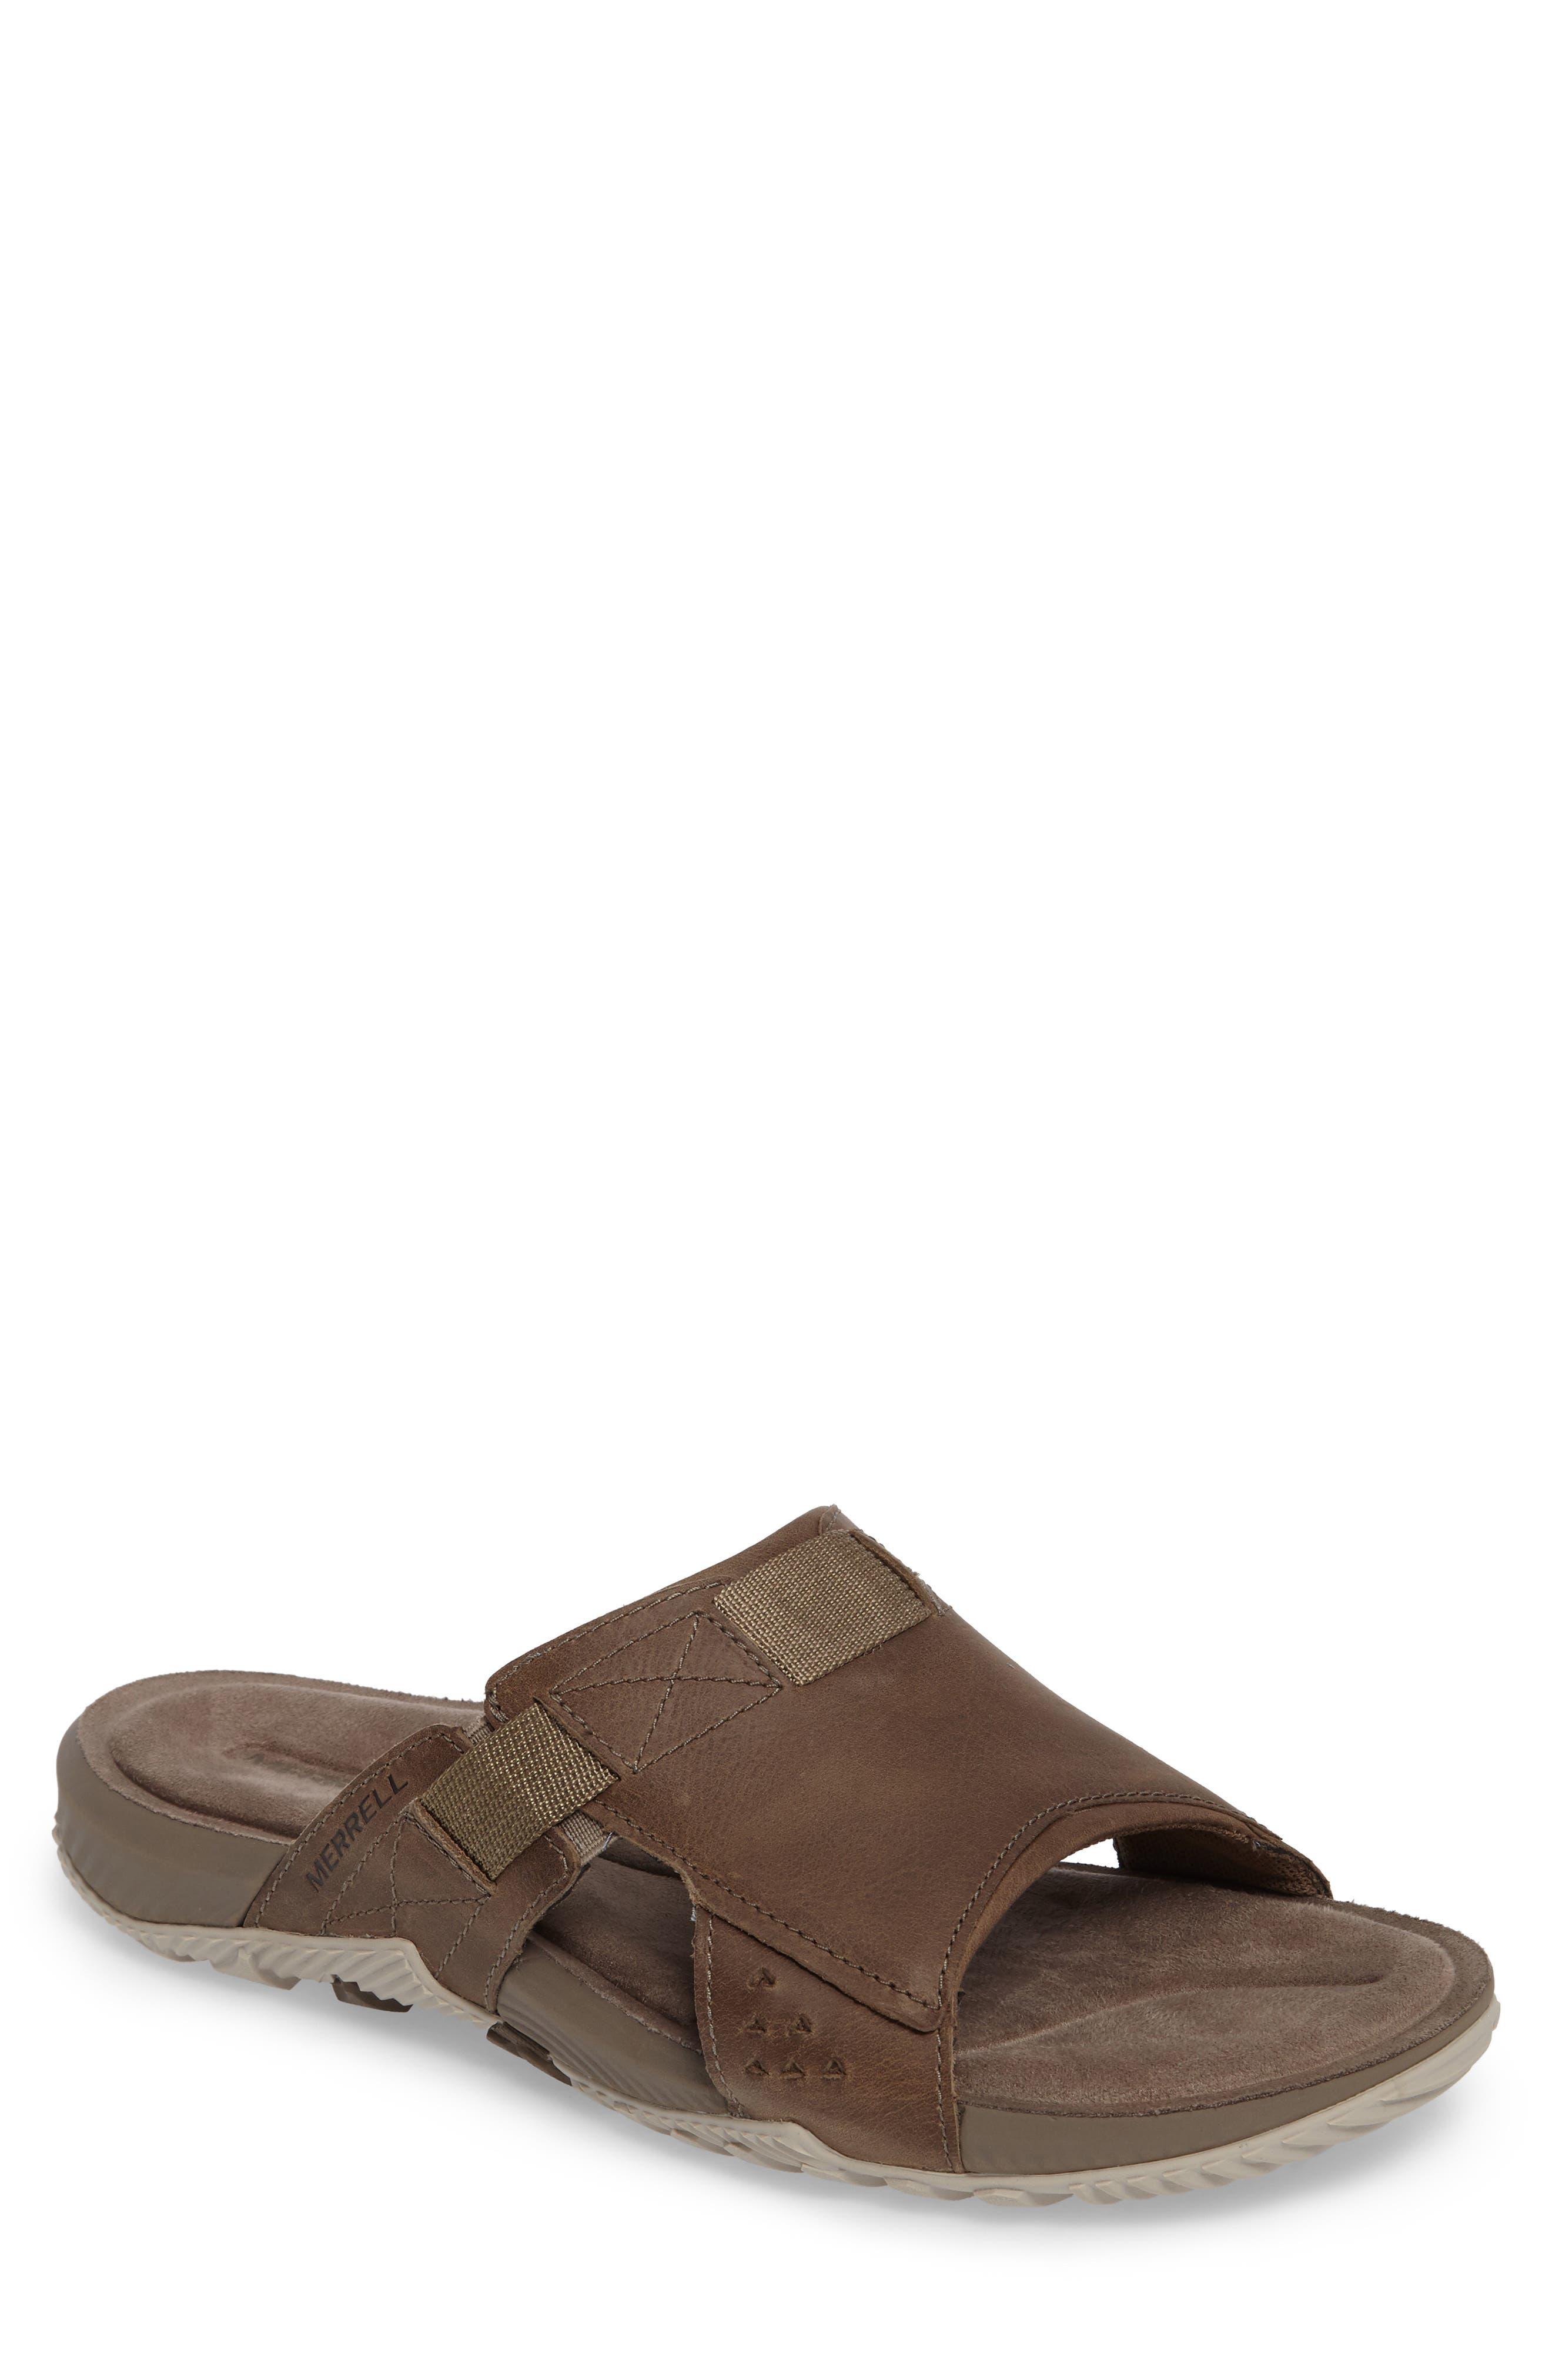 Terrant Slide Sandal,                         Main,                         color, Brindle